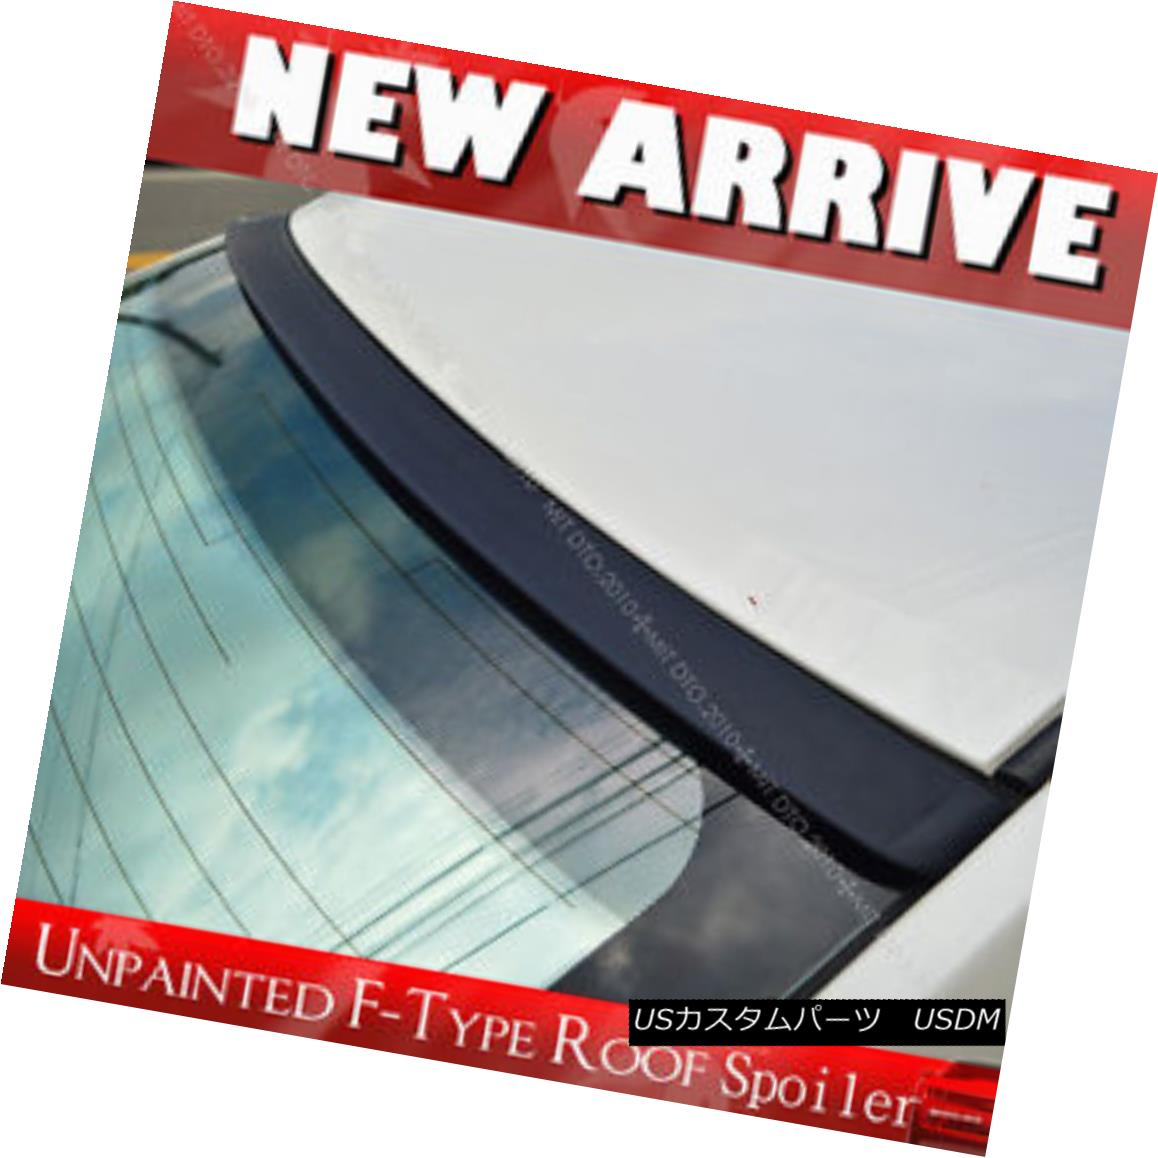 PUF Painted Honda Civic 9th 9 Sedan Rear Roof Spoiler US Model Wing 2012